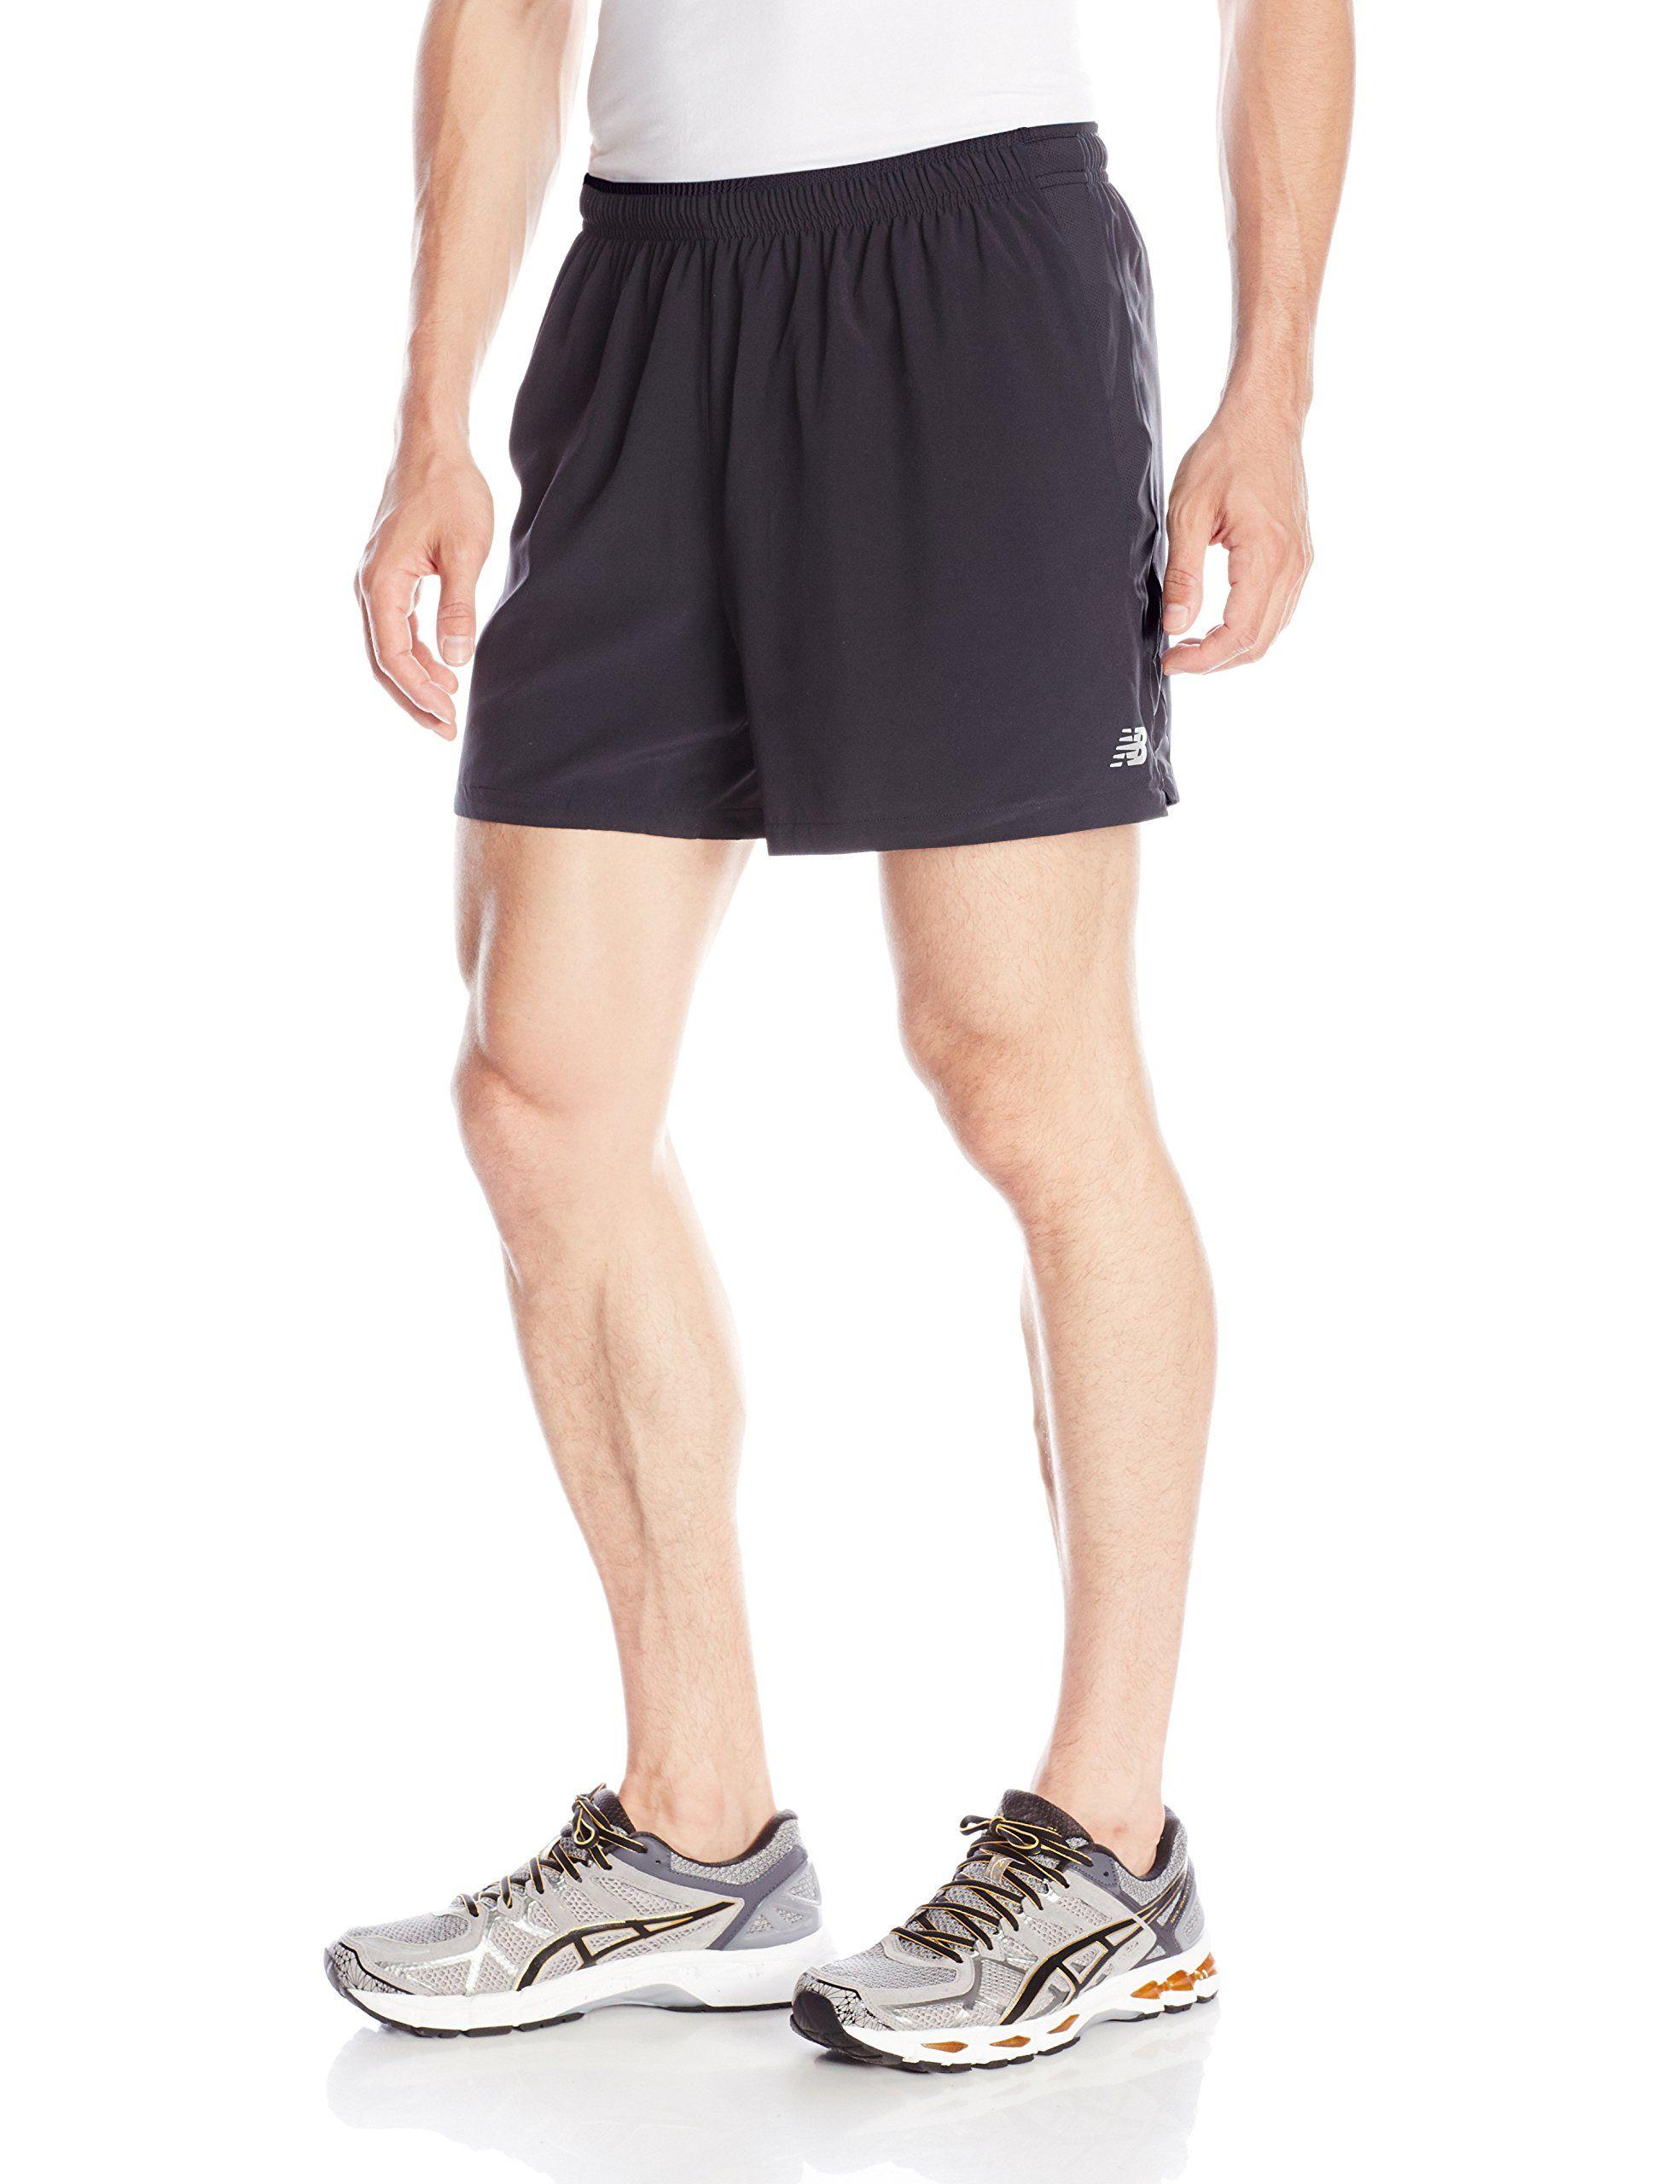 New Balance Short 5 Impact Running Hombre